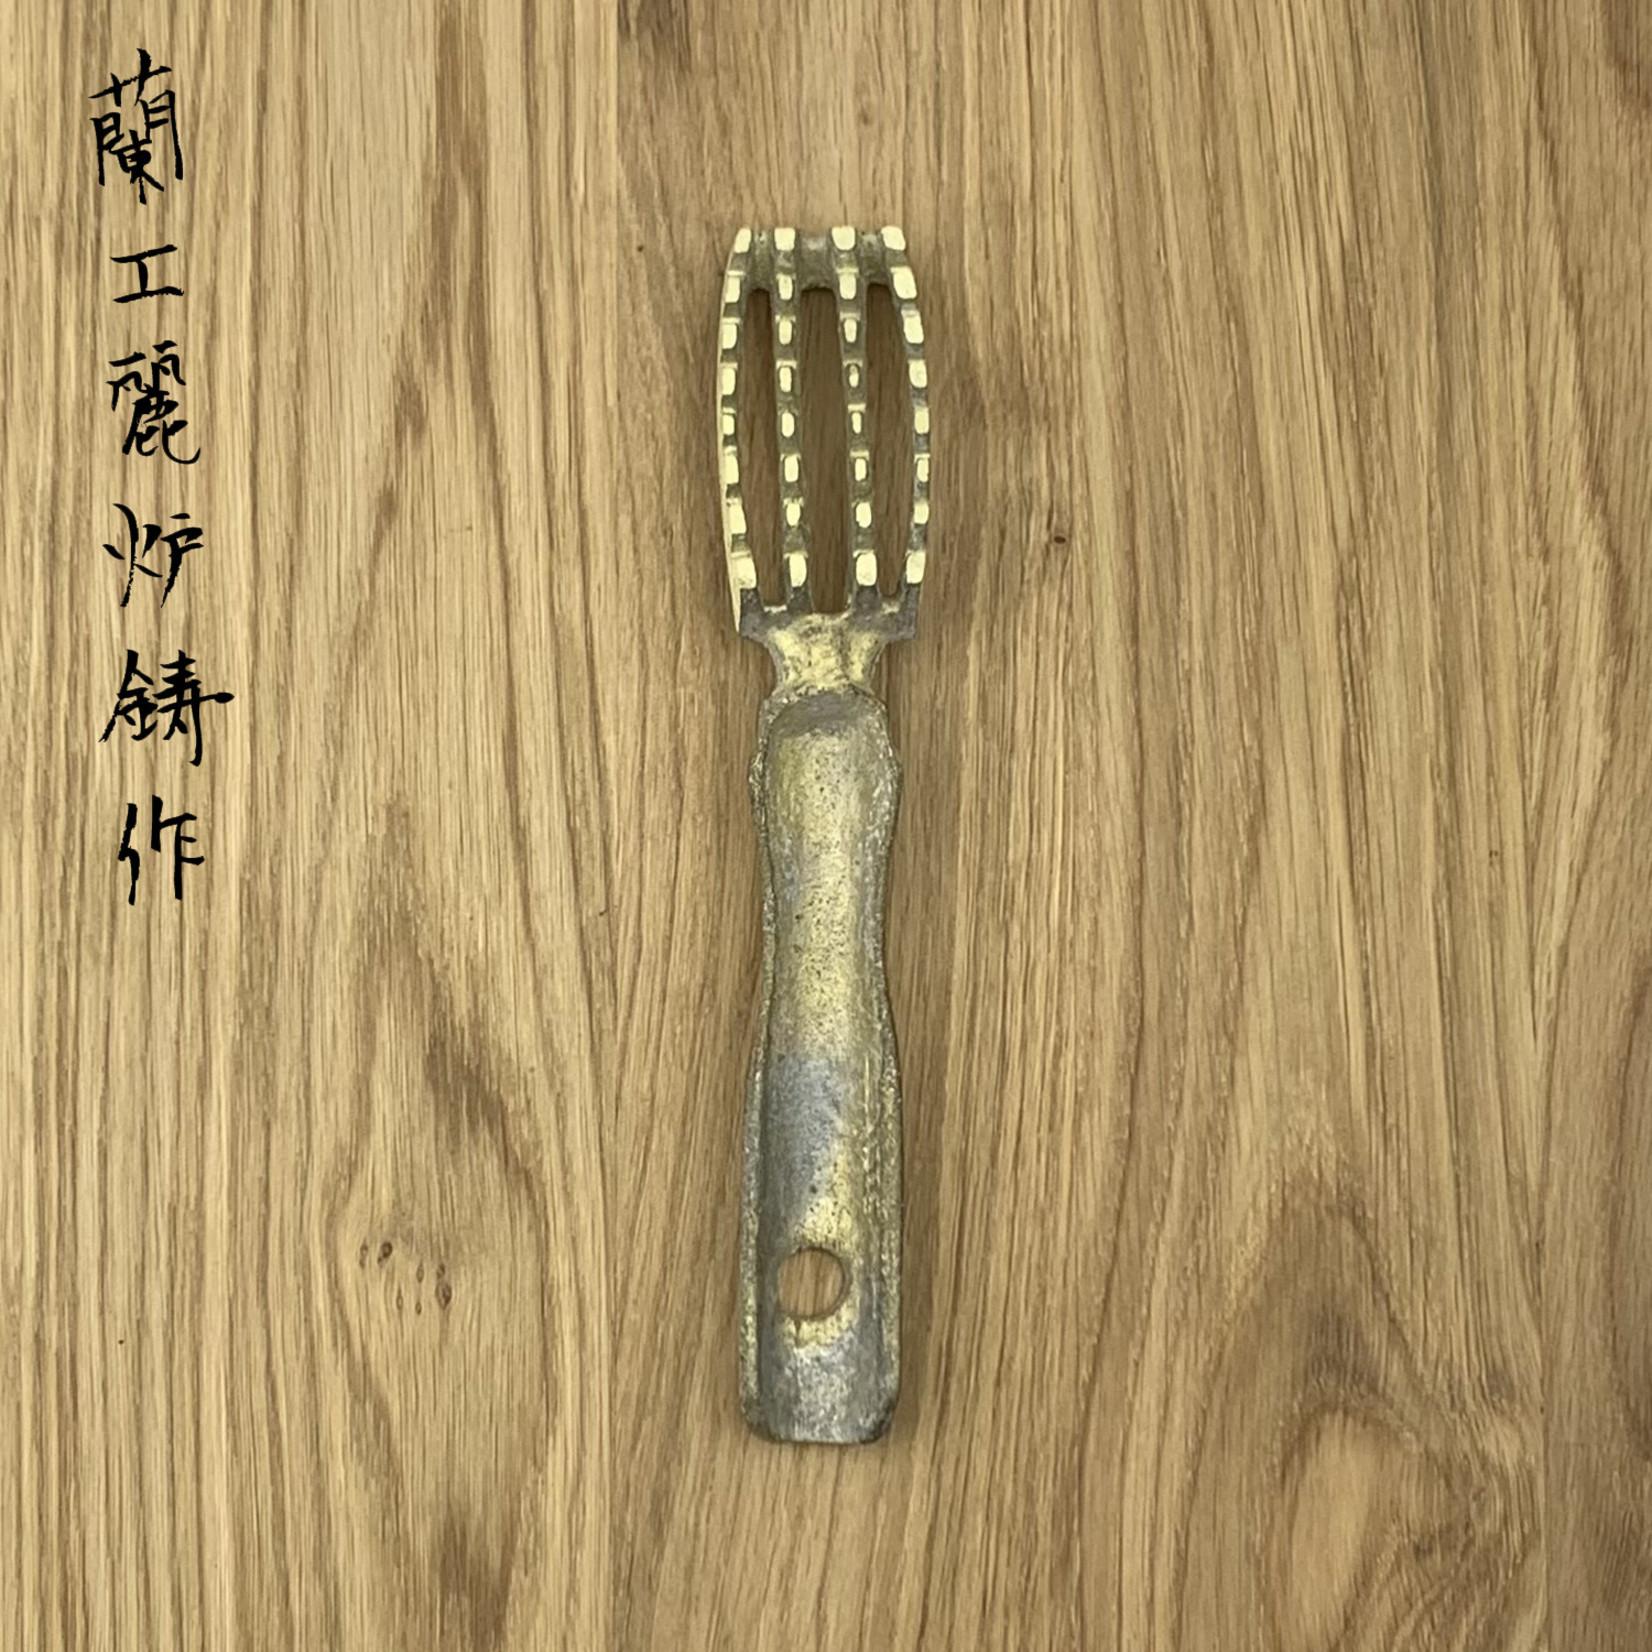 SAKAI TAKAYUKI Scrubber Metaal 180 mm 09063